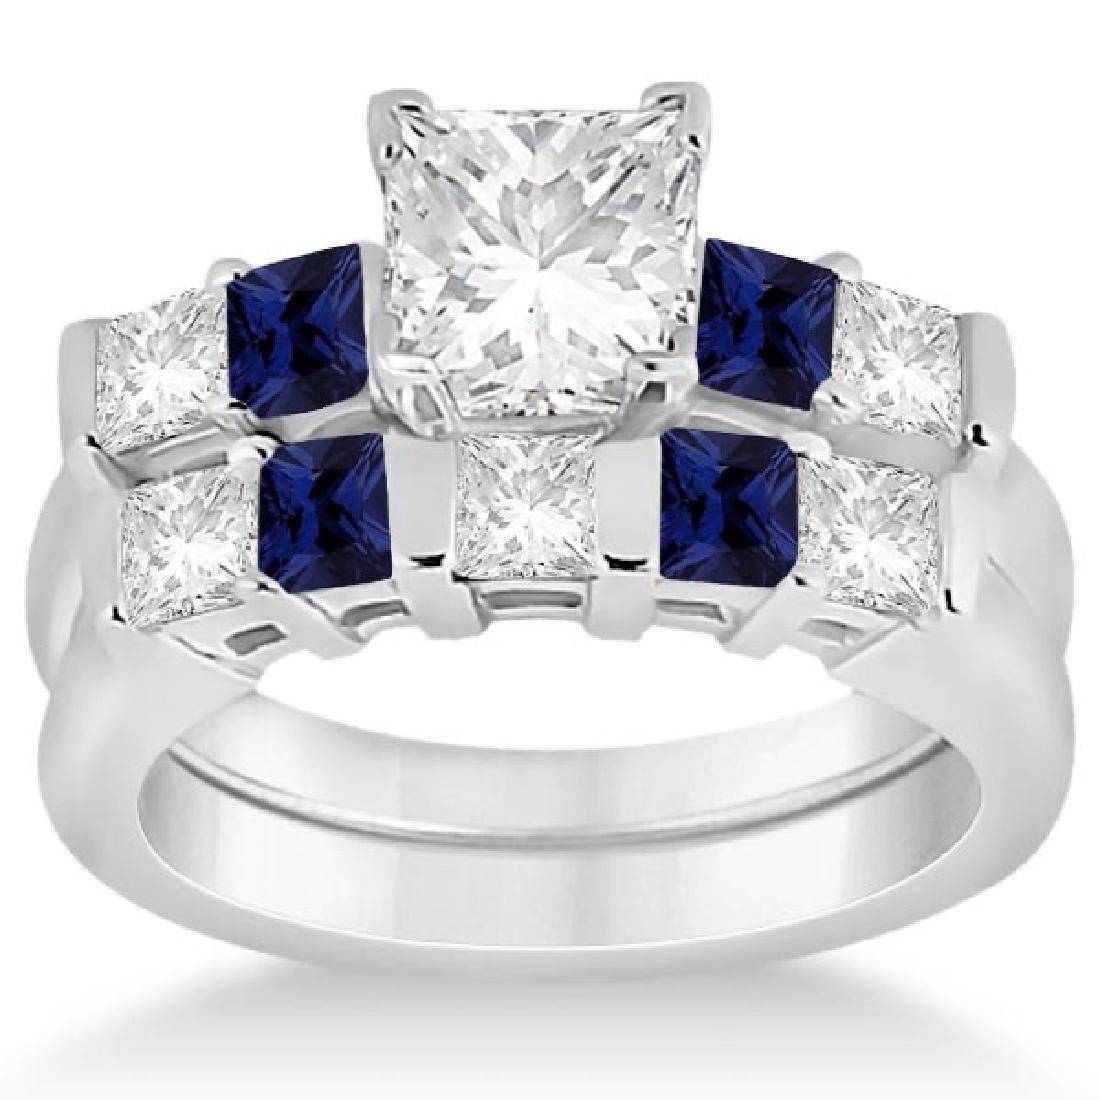 5 Stone Diamond and Blue Sapphire Bridal Set 14K White